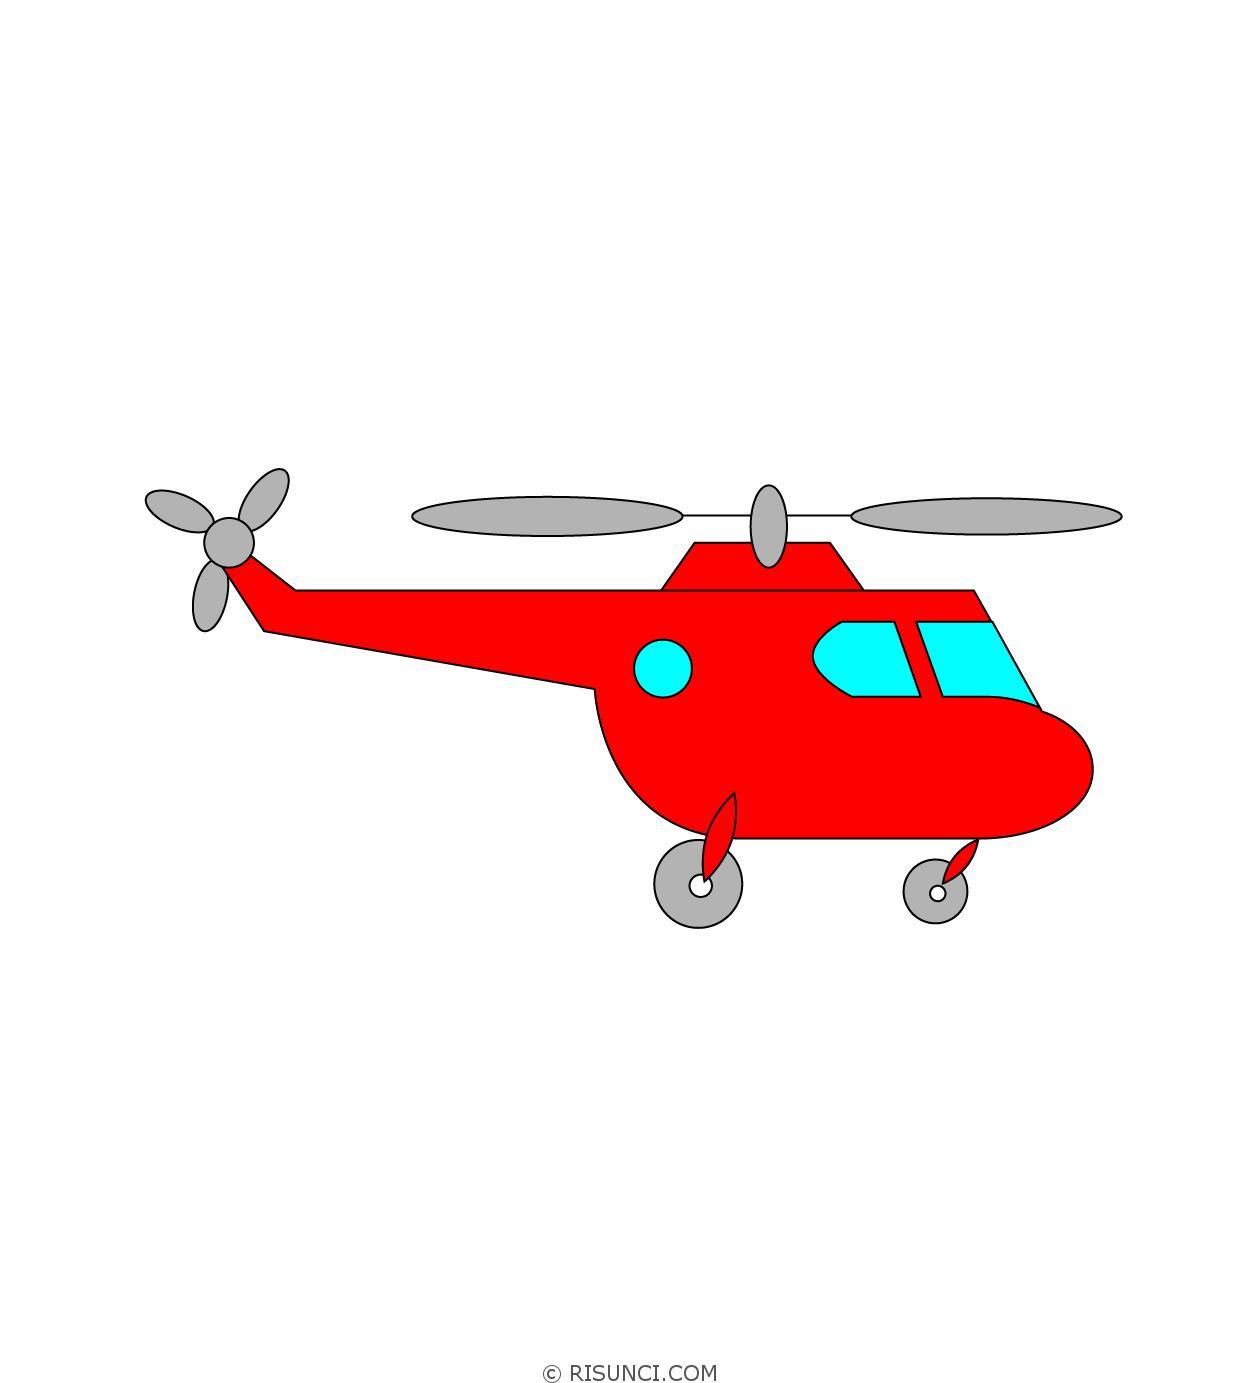 картинка рисунок вертолета кадрах видно